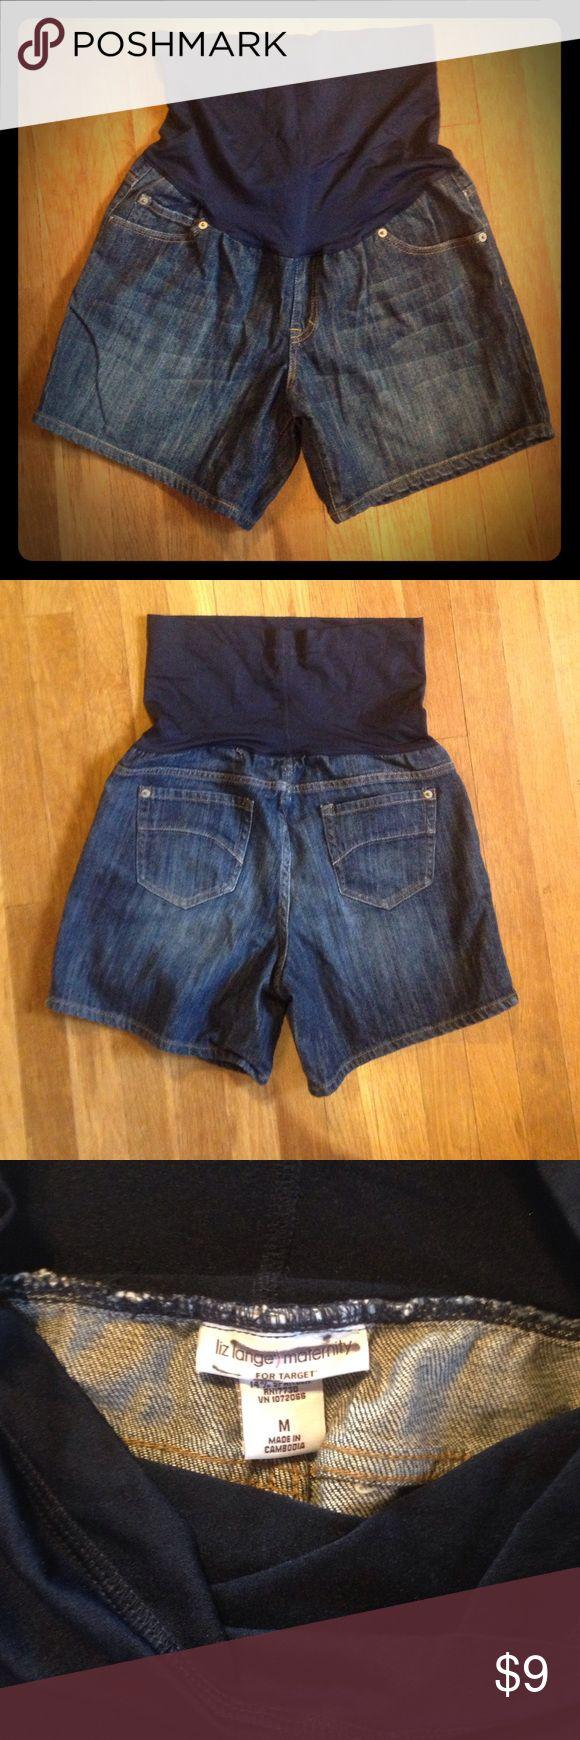 Denim Maternity Shorts NWOT Liz Lange Maternity denim shorts are NWOT. Smoke free home. liz lange maternity Shorts Jean Shorts